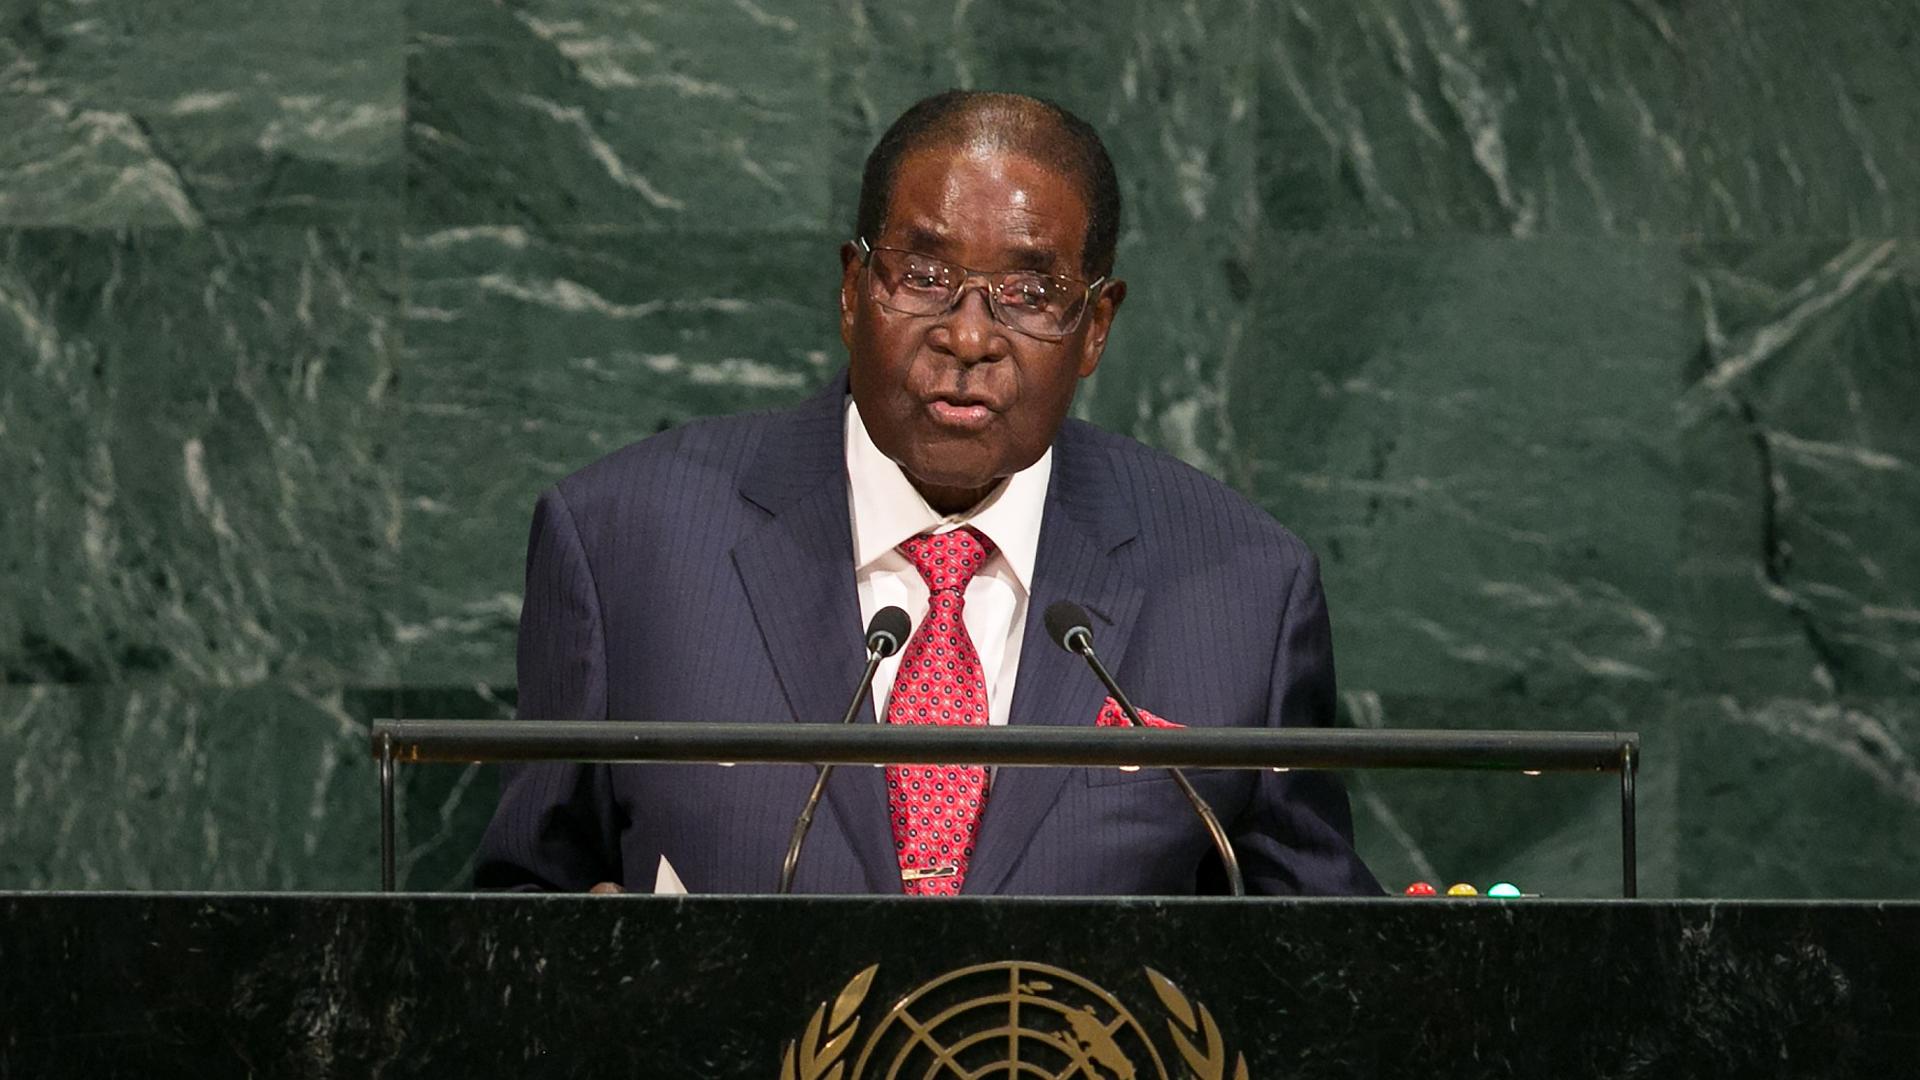 Zimbabwe's President Robert Gabriel Mugabe, Zimbabwe, at United Nations UN general assembly in New York29787447-159532